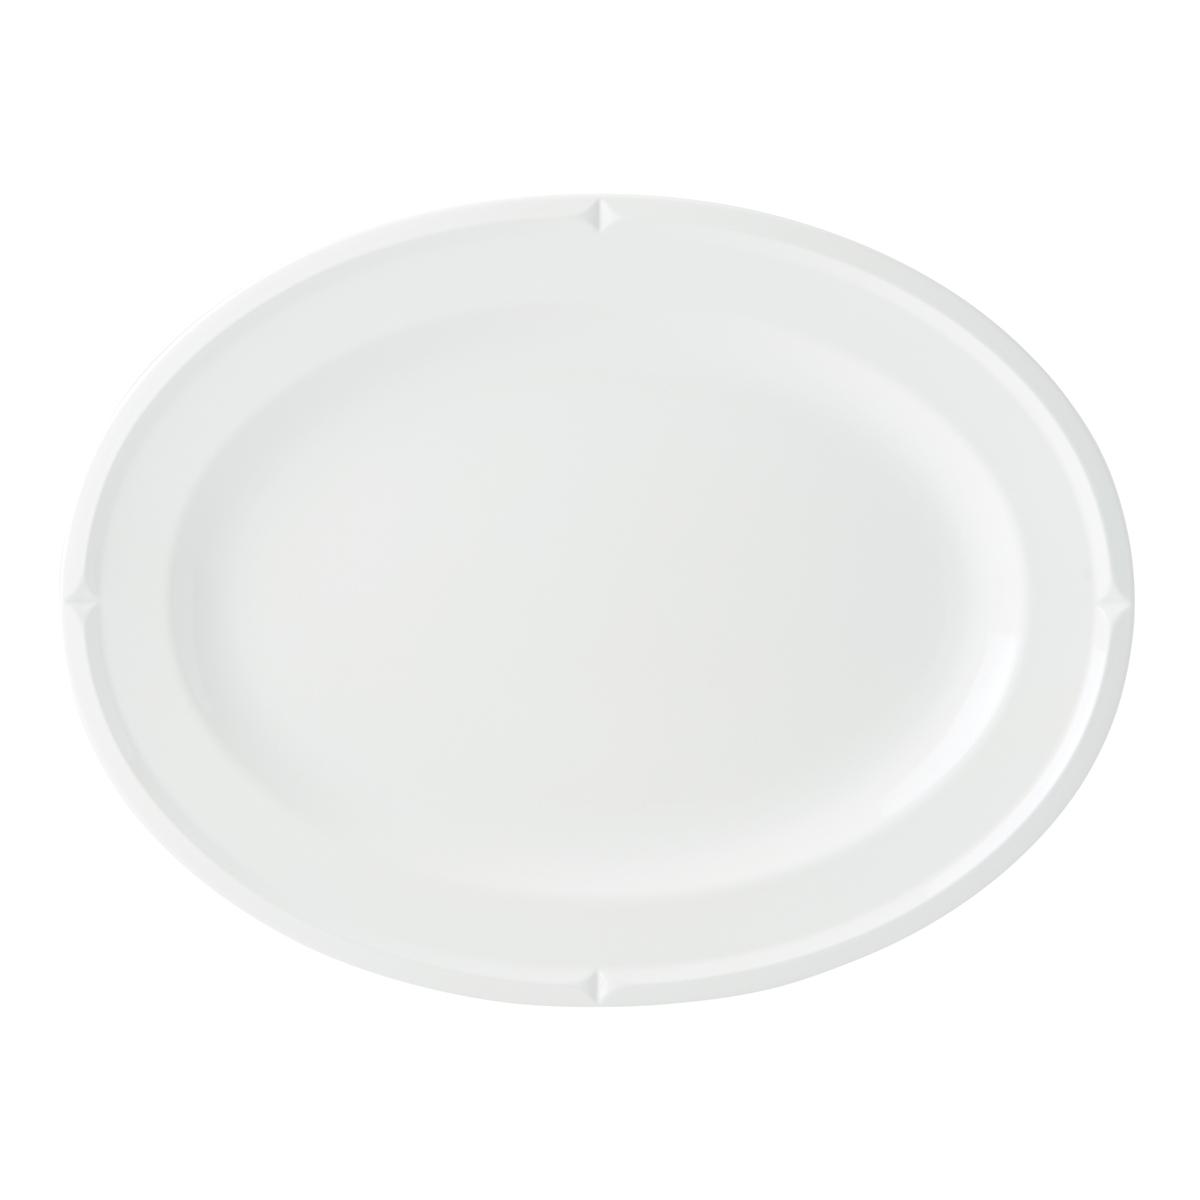 Kate Spade China by Lenox, Tribeca Cream Platter